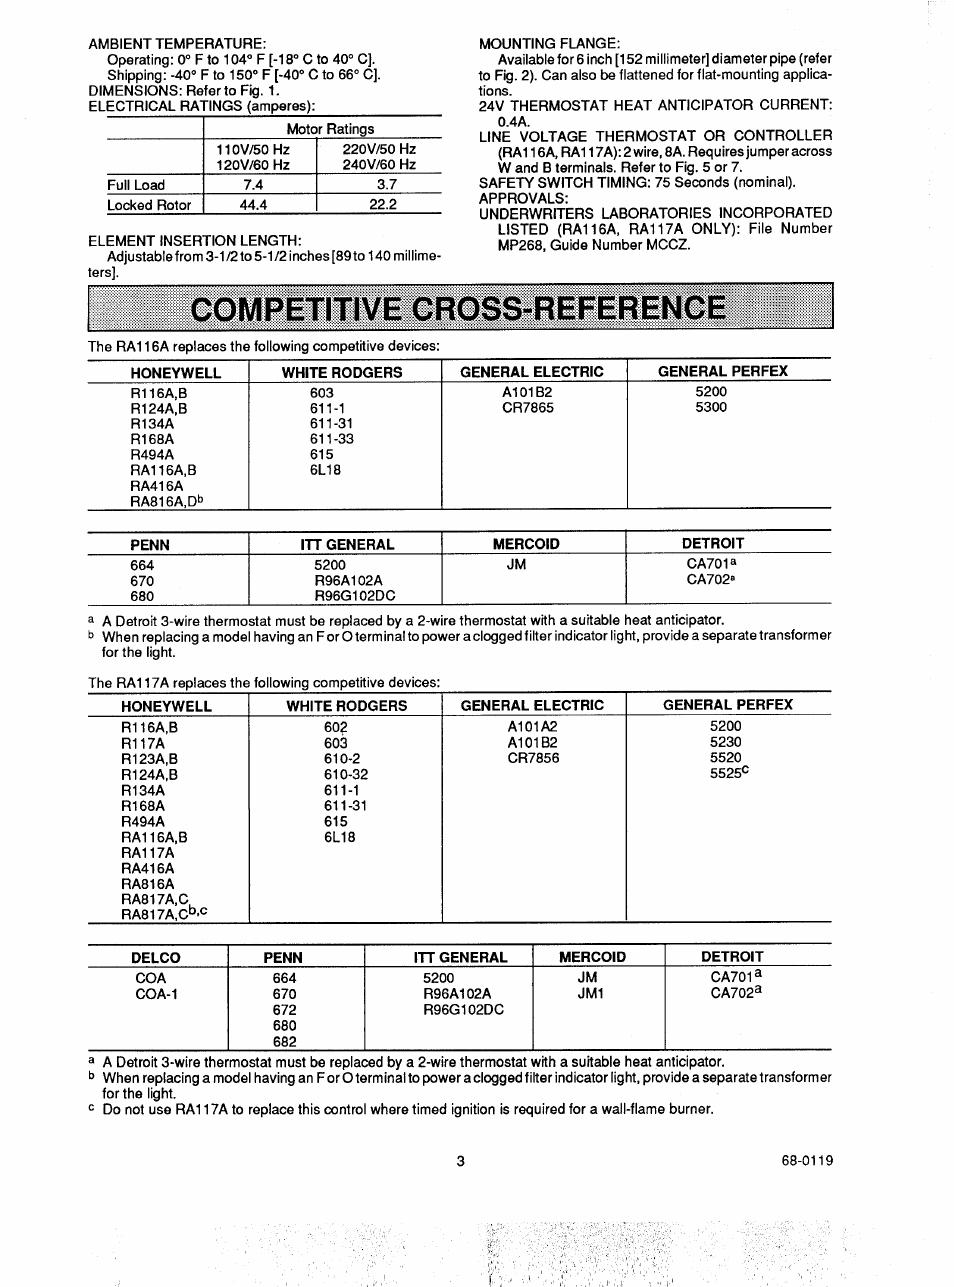 honeywell pro 2000 user manual